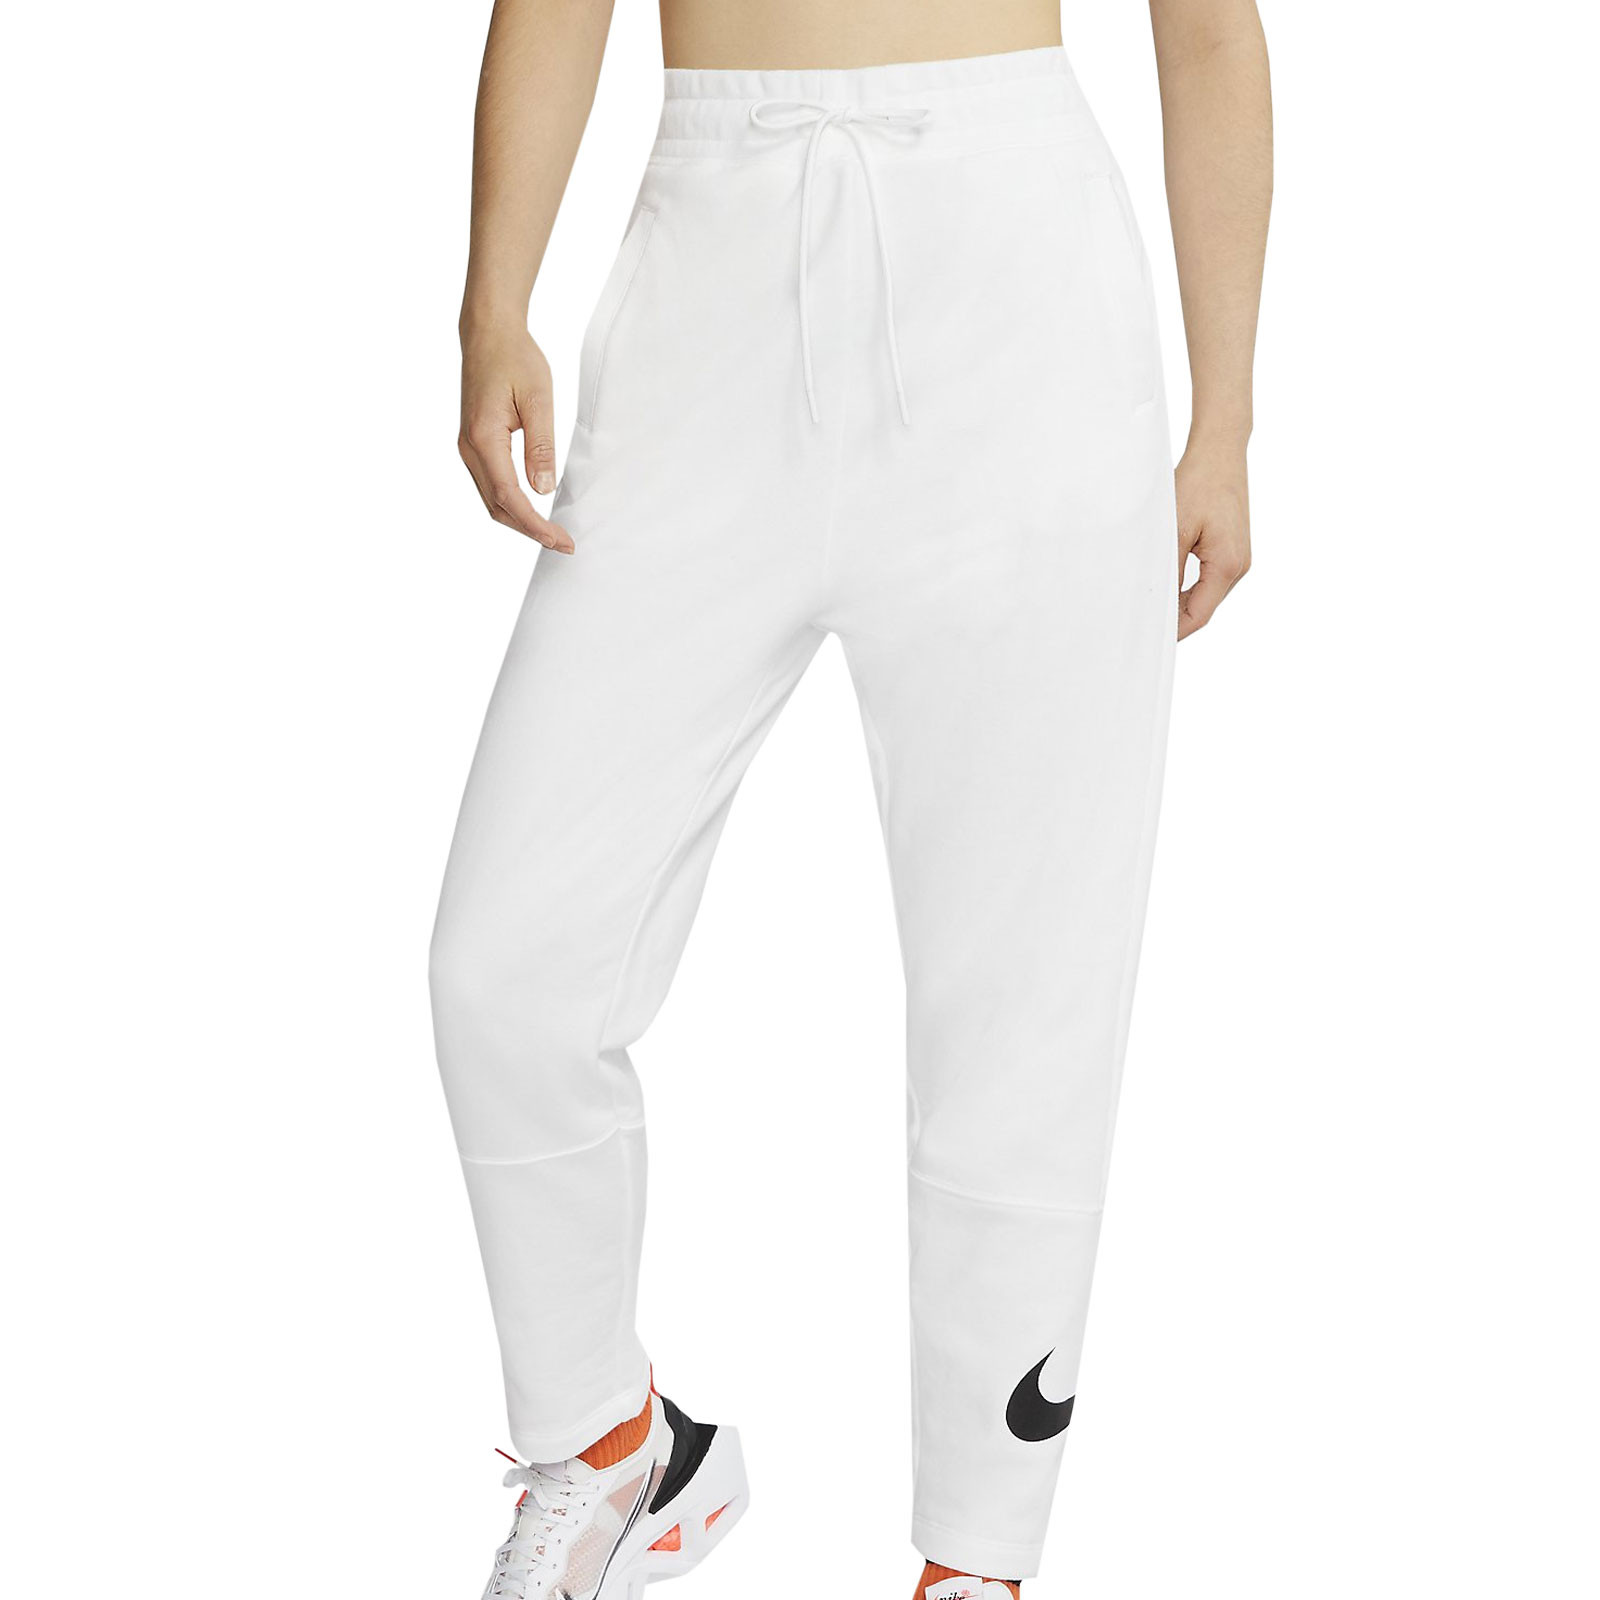 Pantalon Nike Gris Mujer 50 Descuento Gigarobot Net